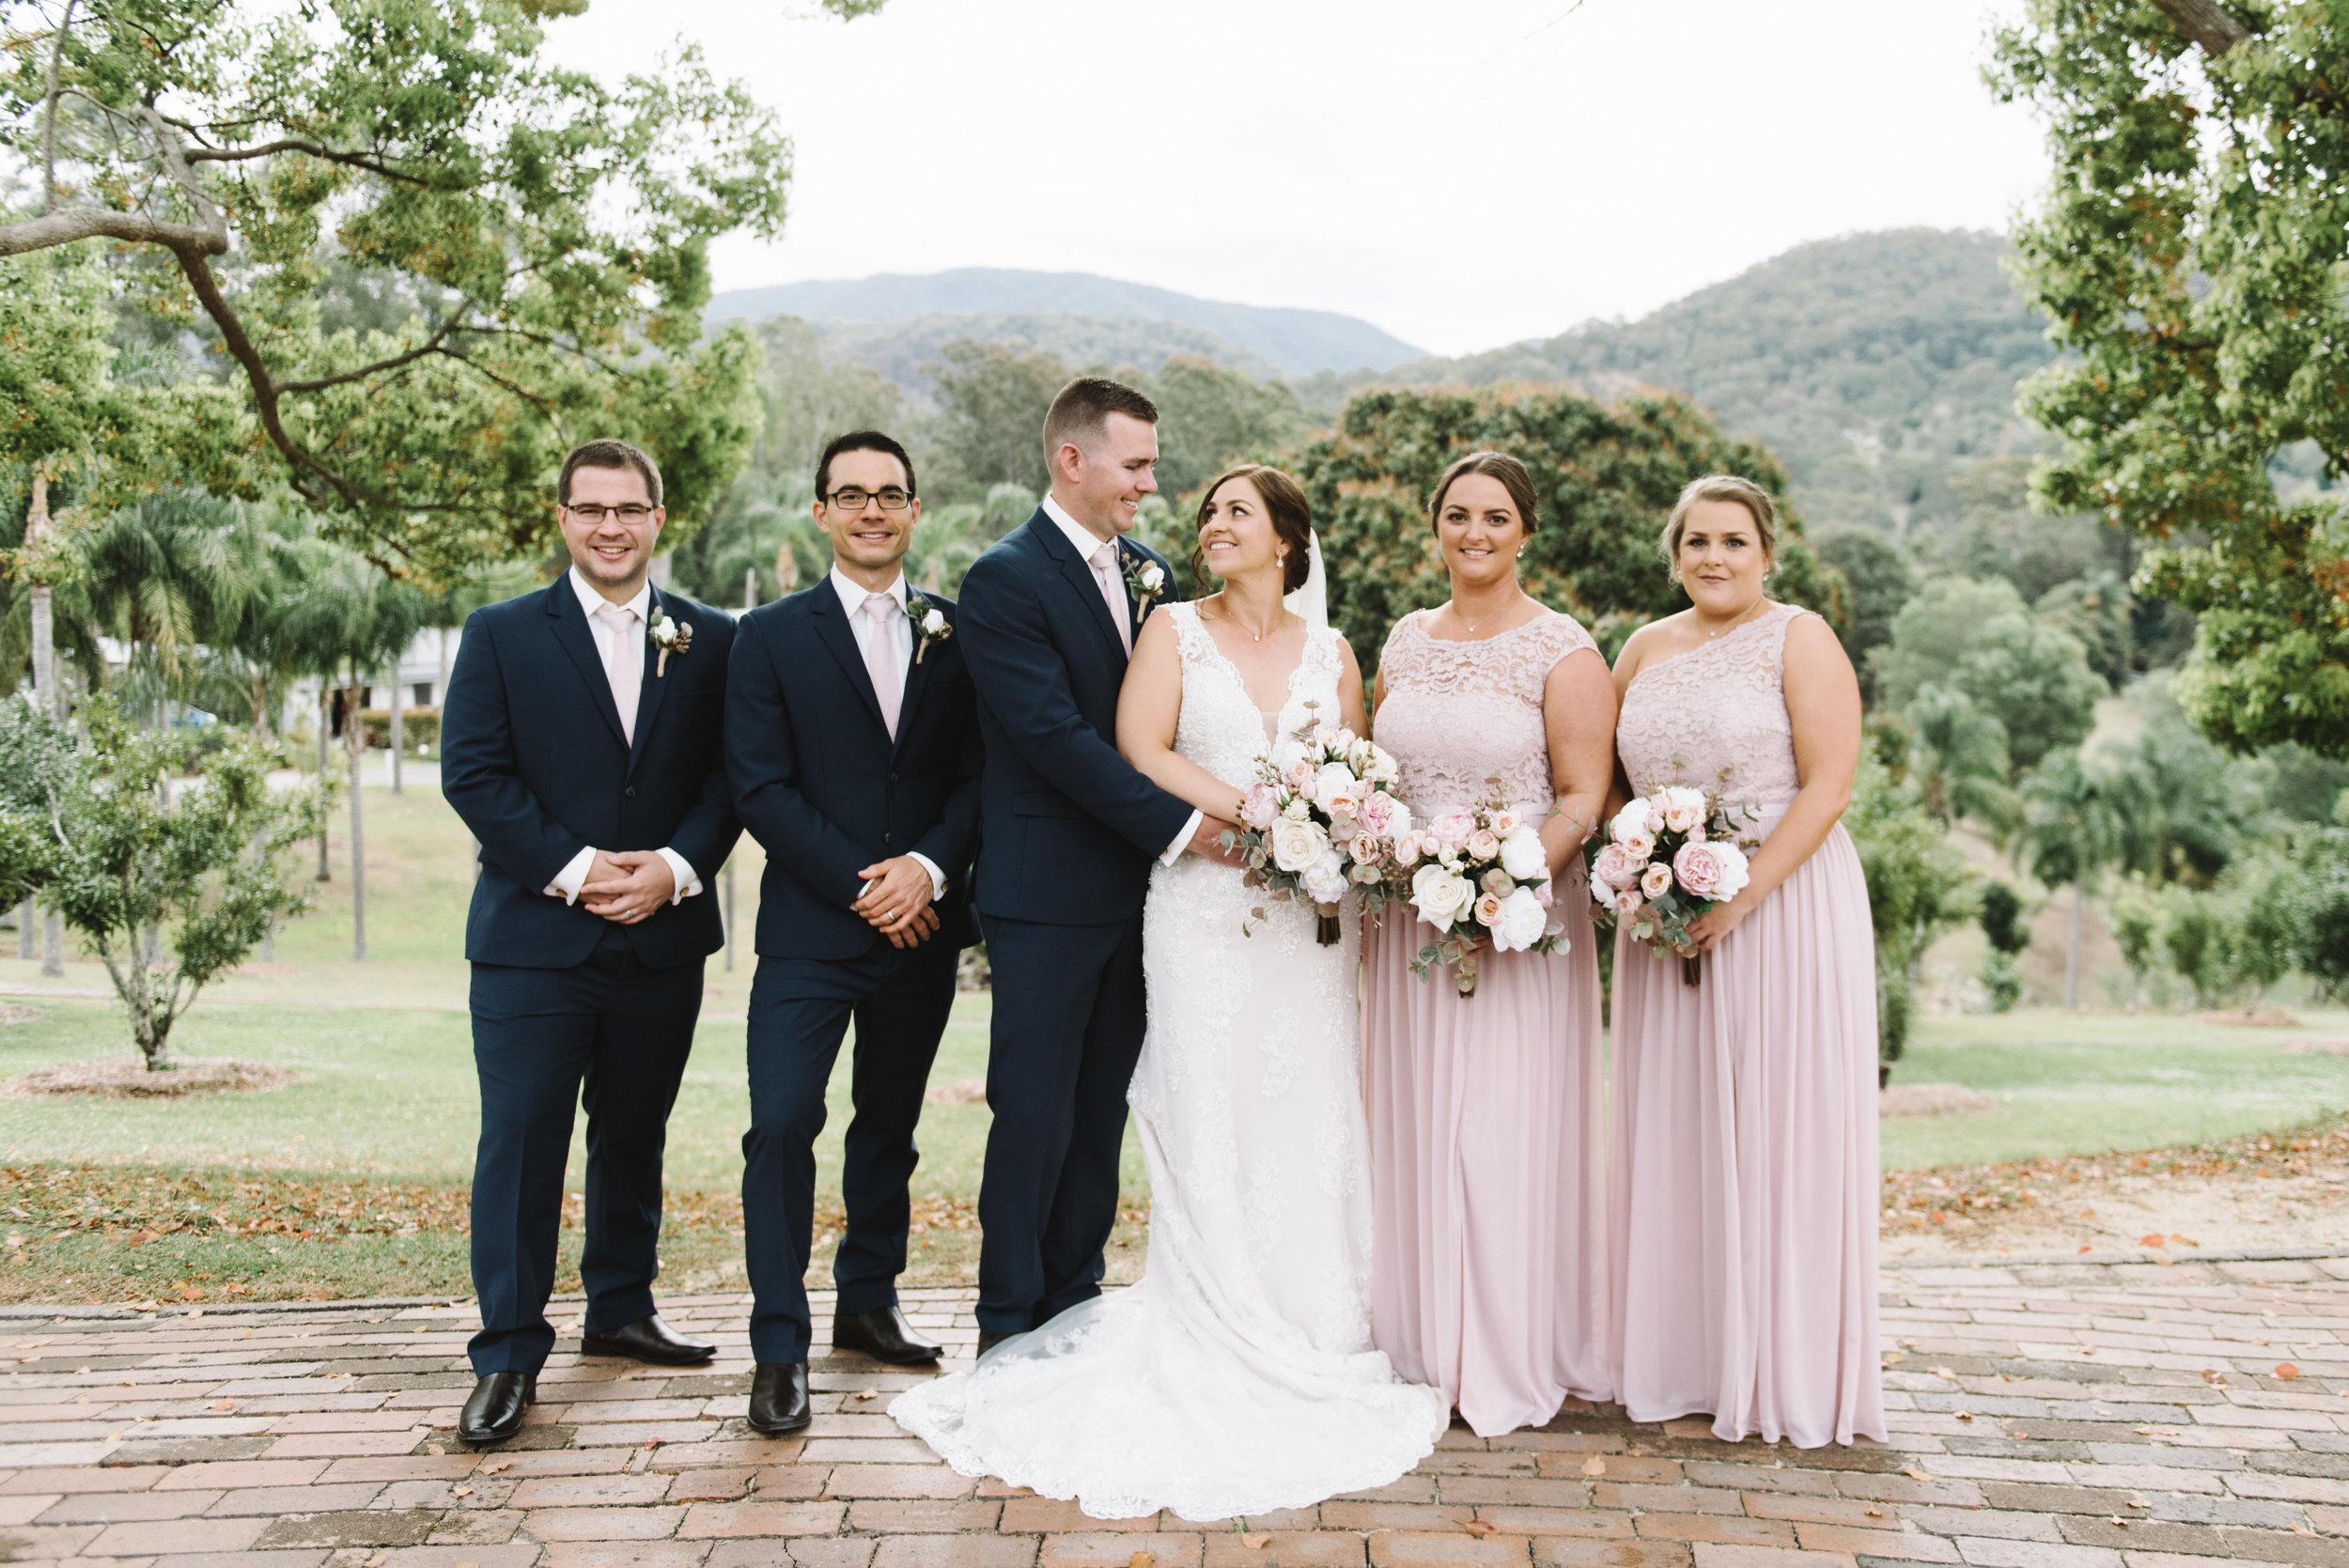 LAURENOLIVIA-austinvilla-estate-wedding-56.jpg